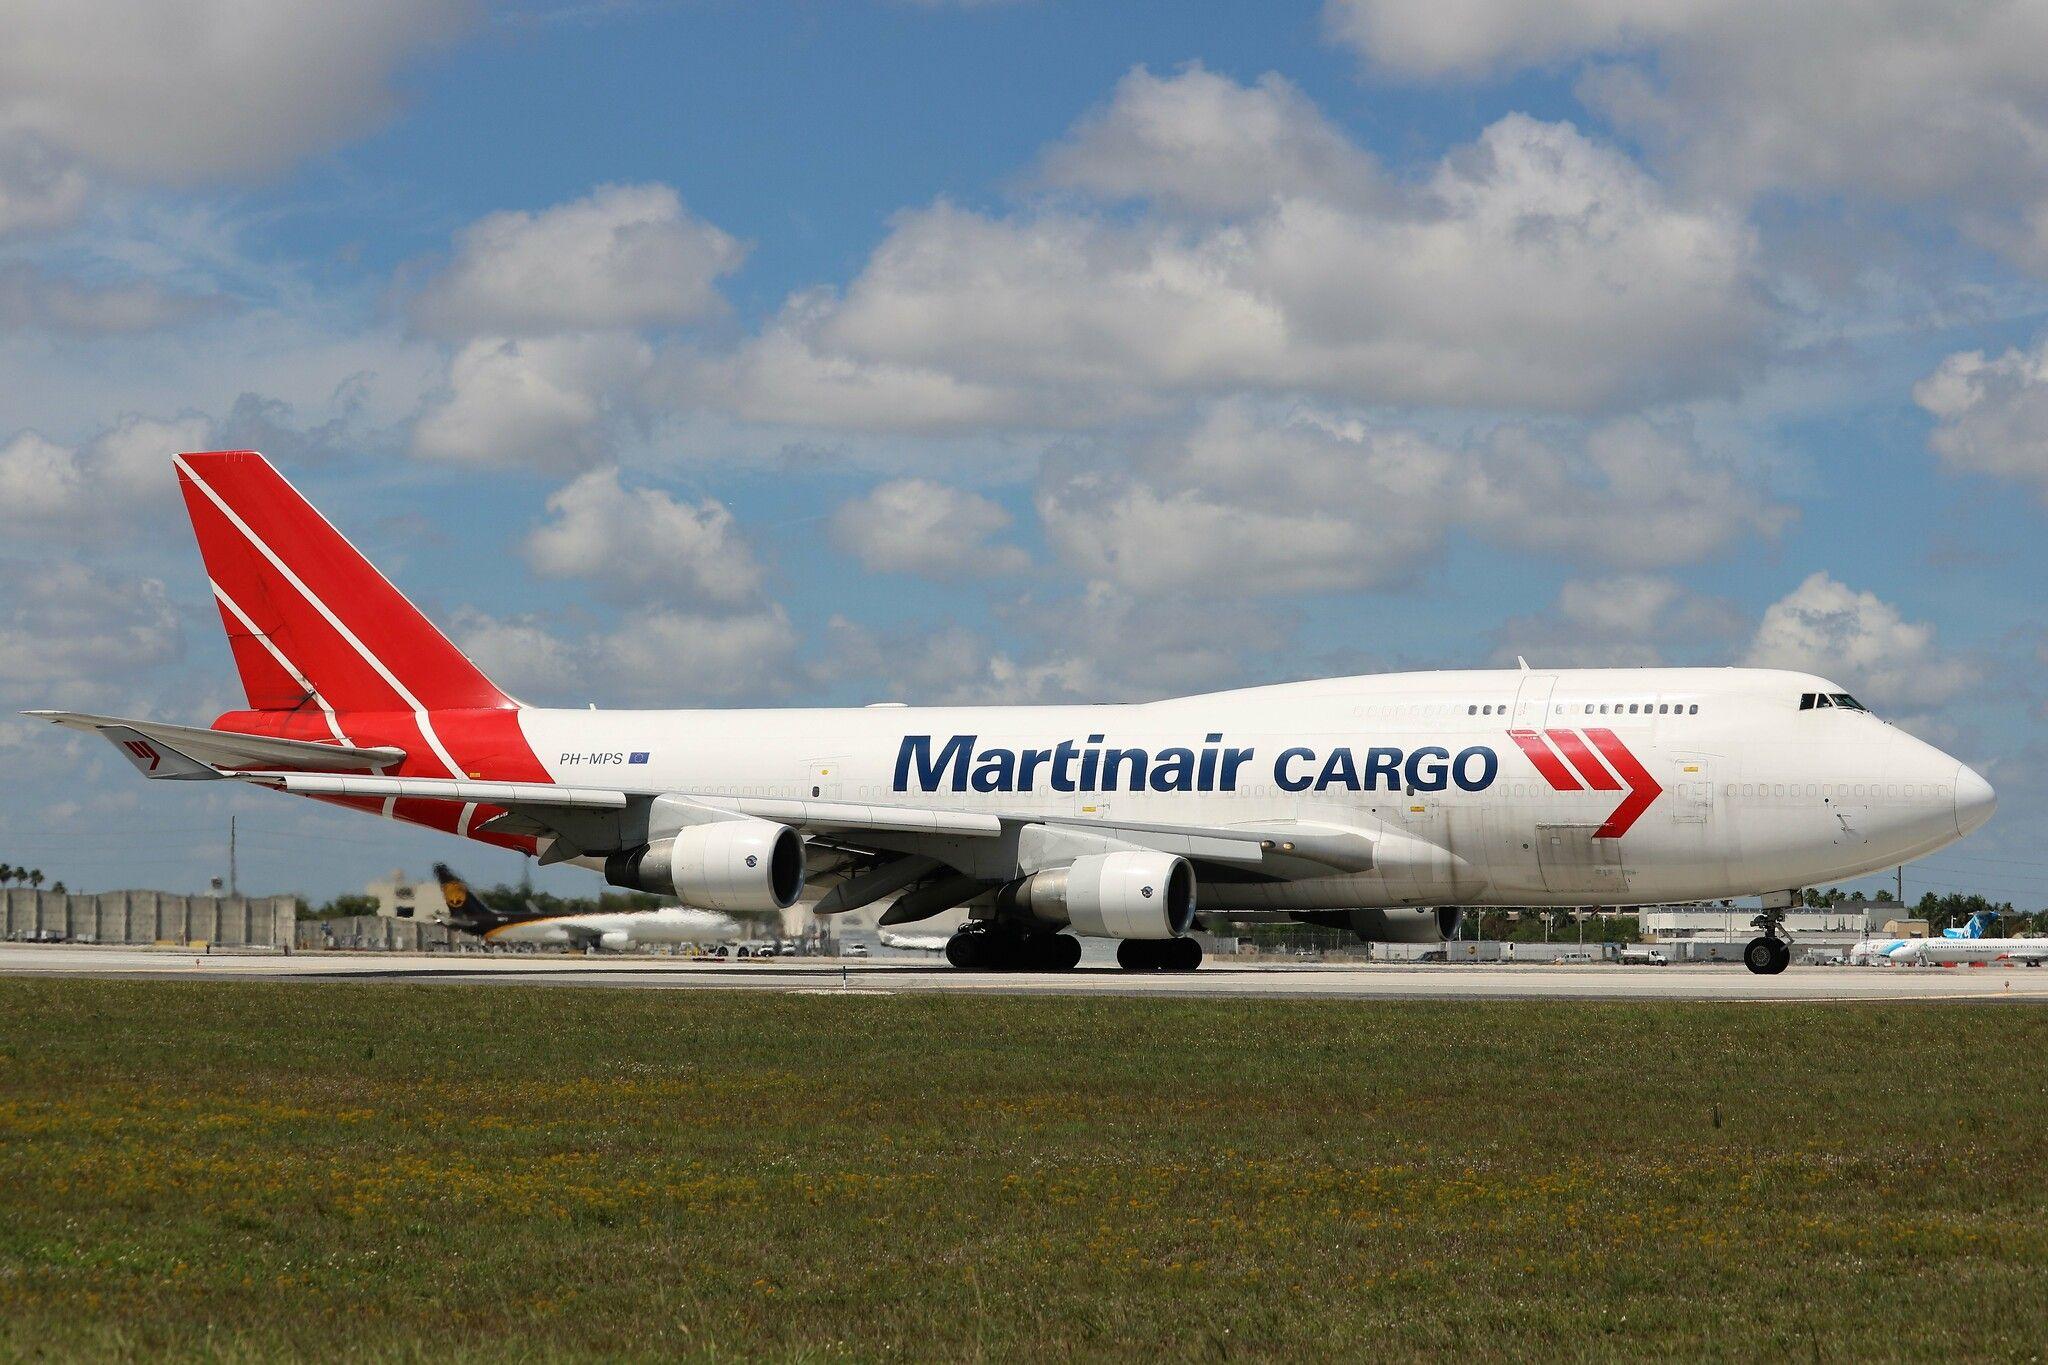 Martinair Holland 747 Boeing aircraft, Holland, Cargo